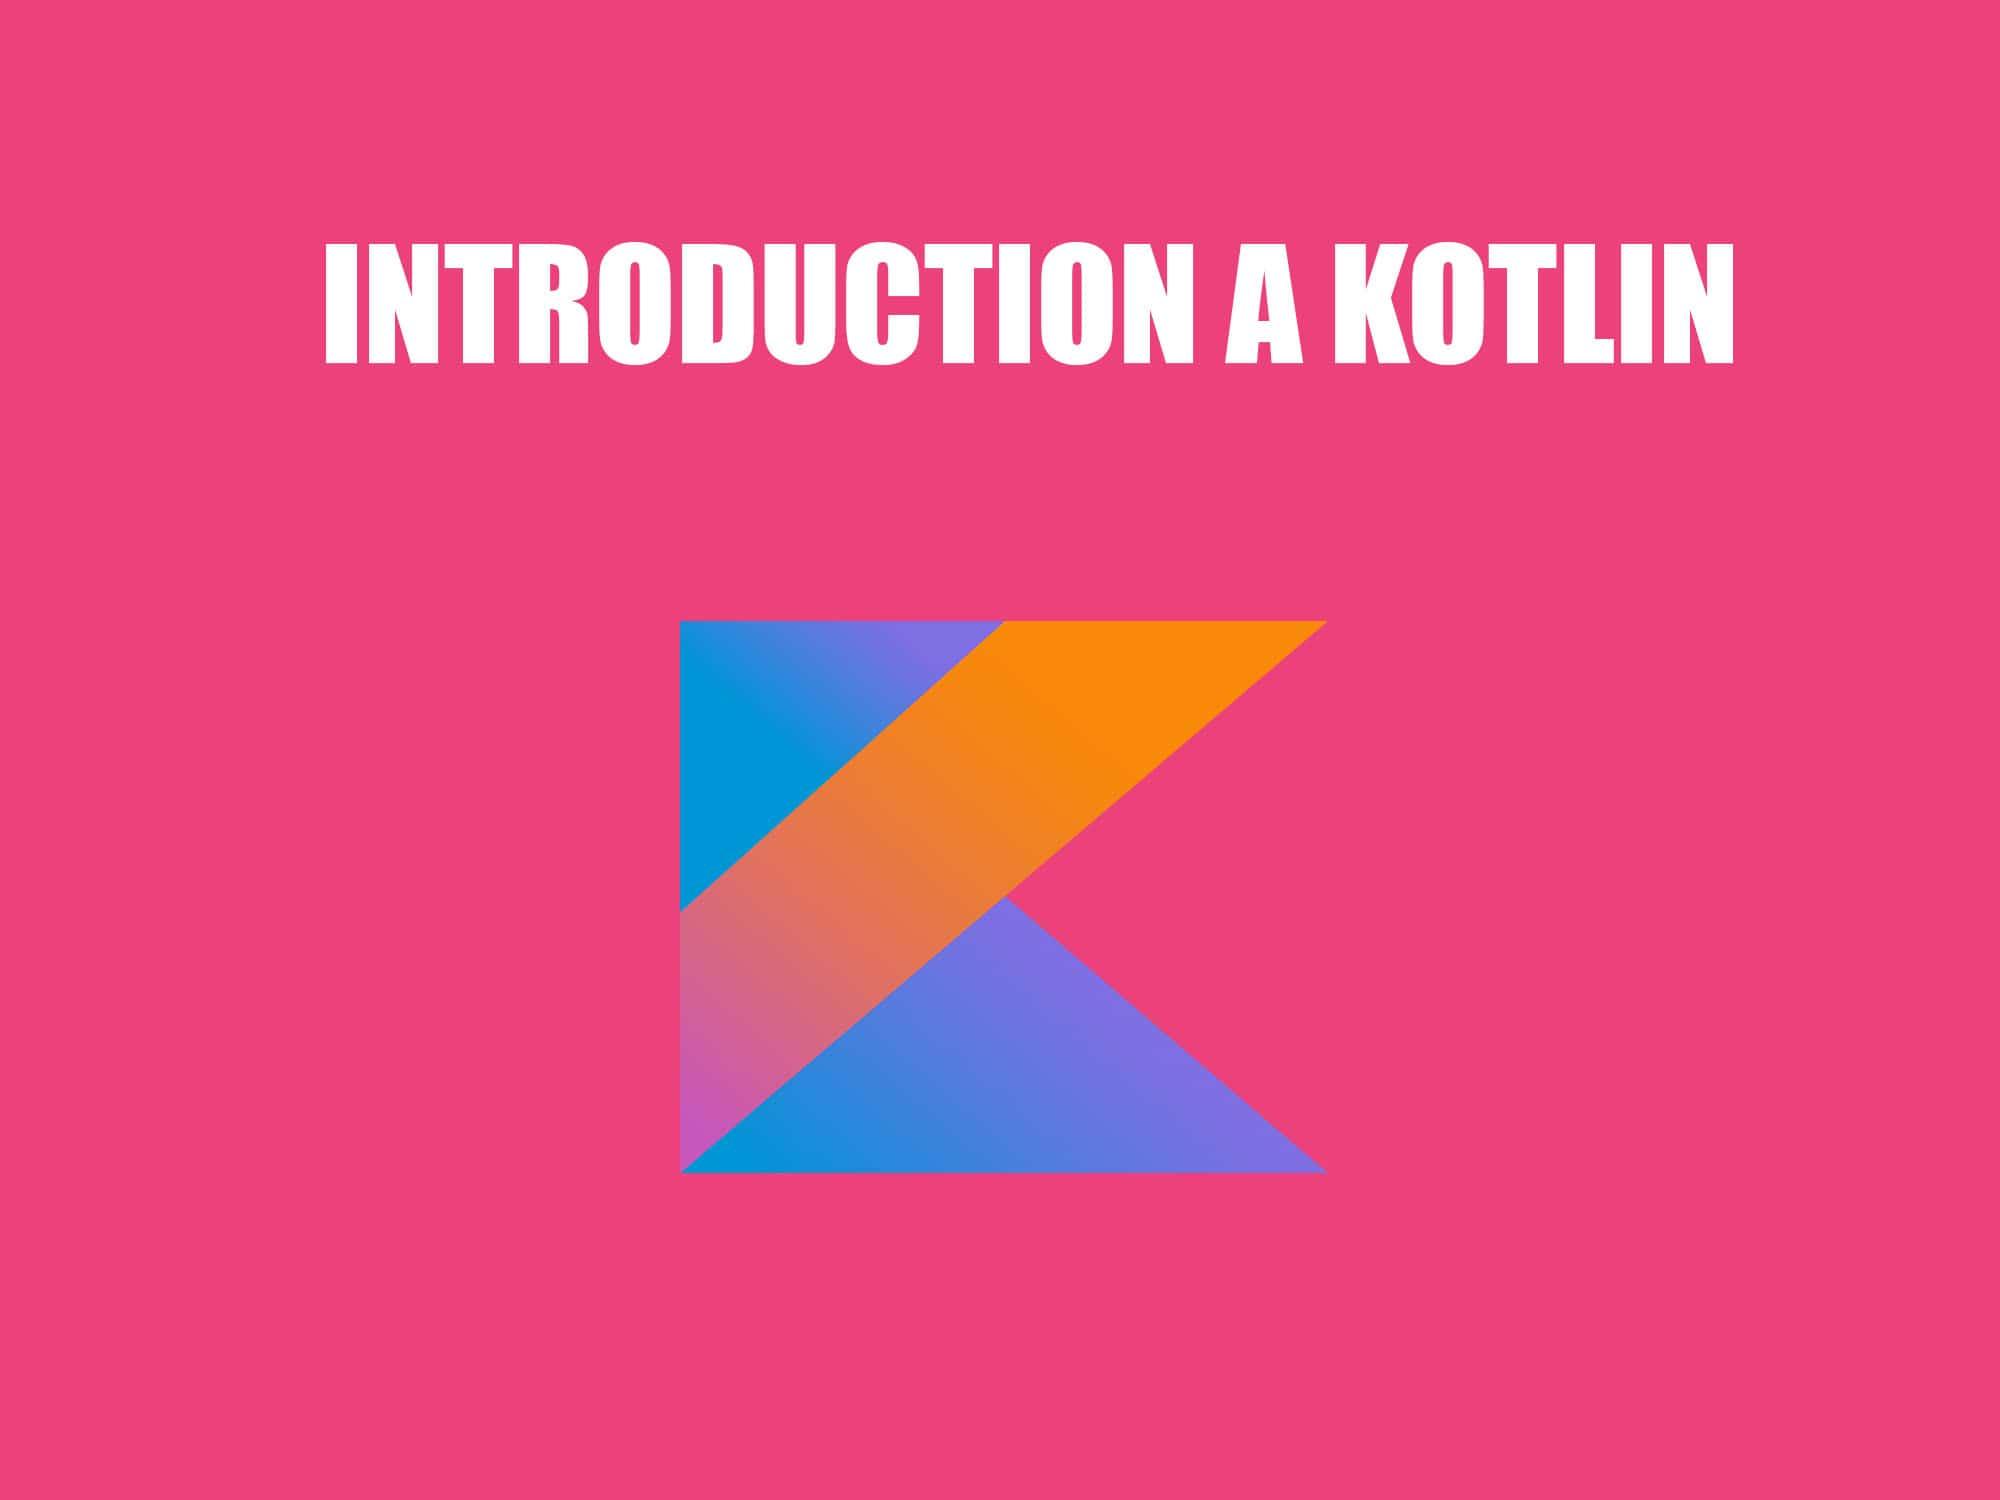 introduction a kotlin